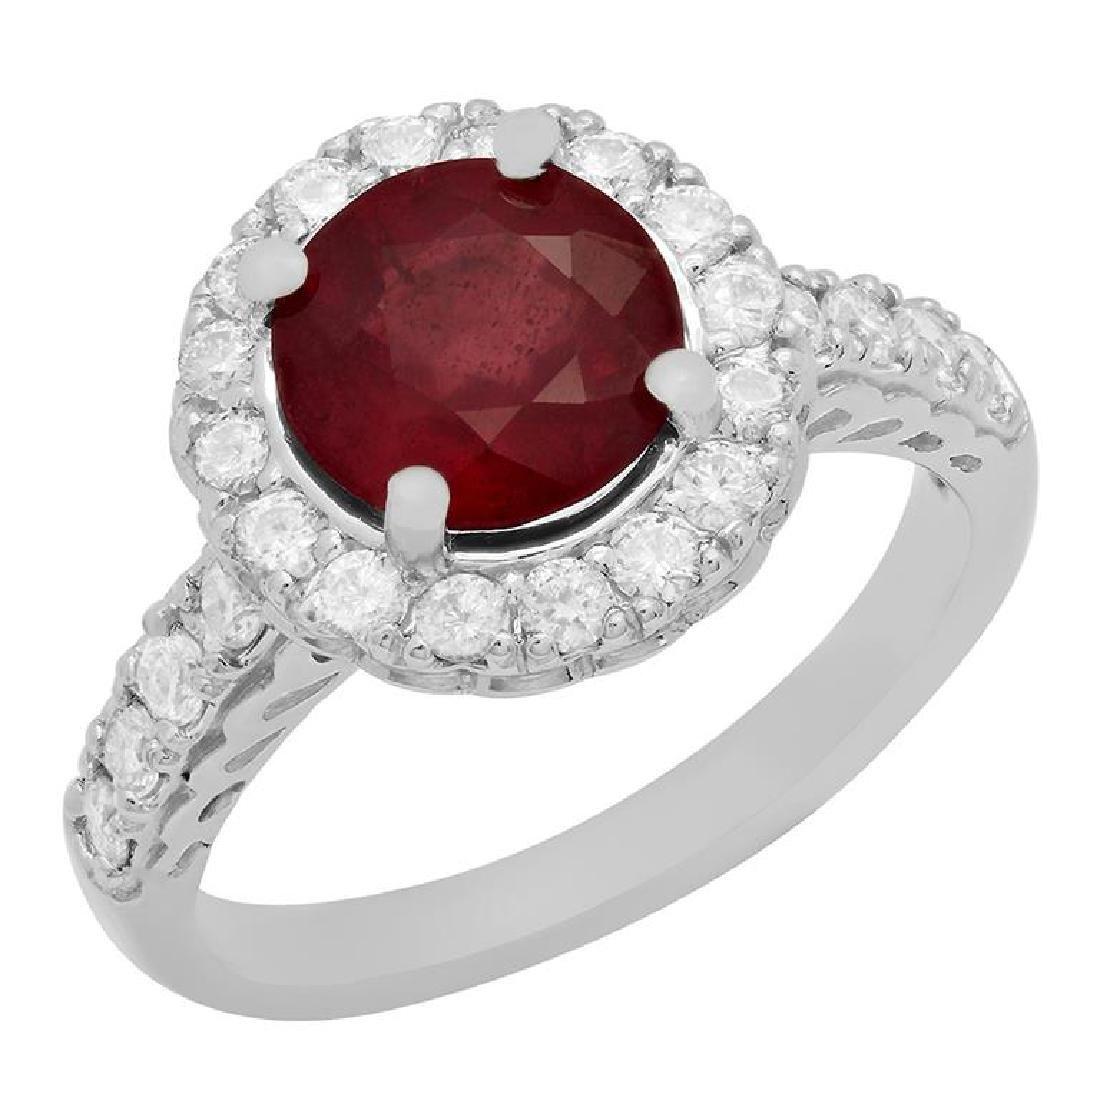 14k White Gold 2.15ct Ruby 0.78ct Diamond Ring